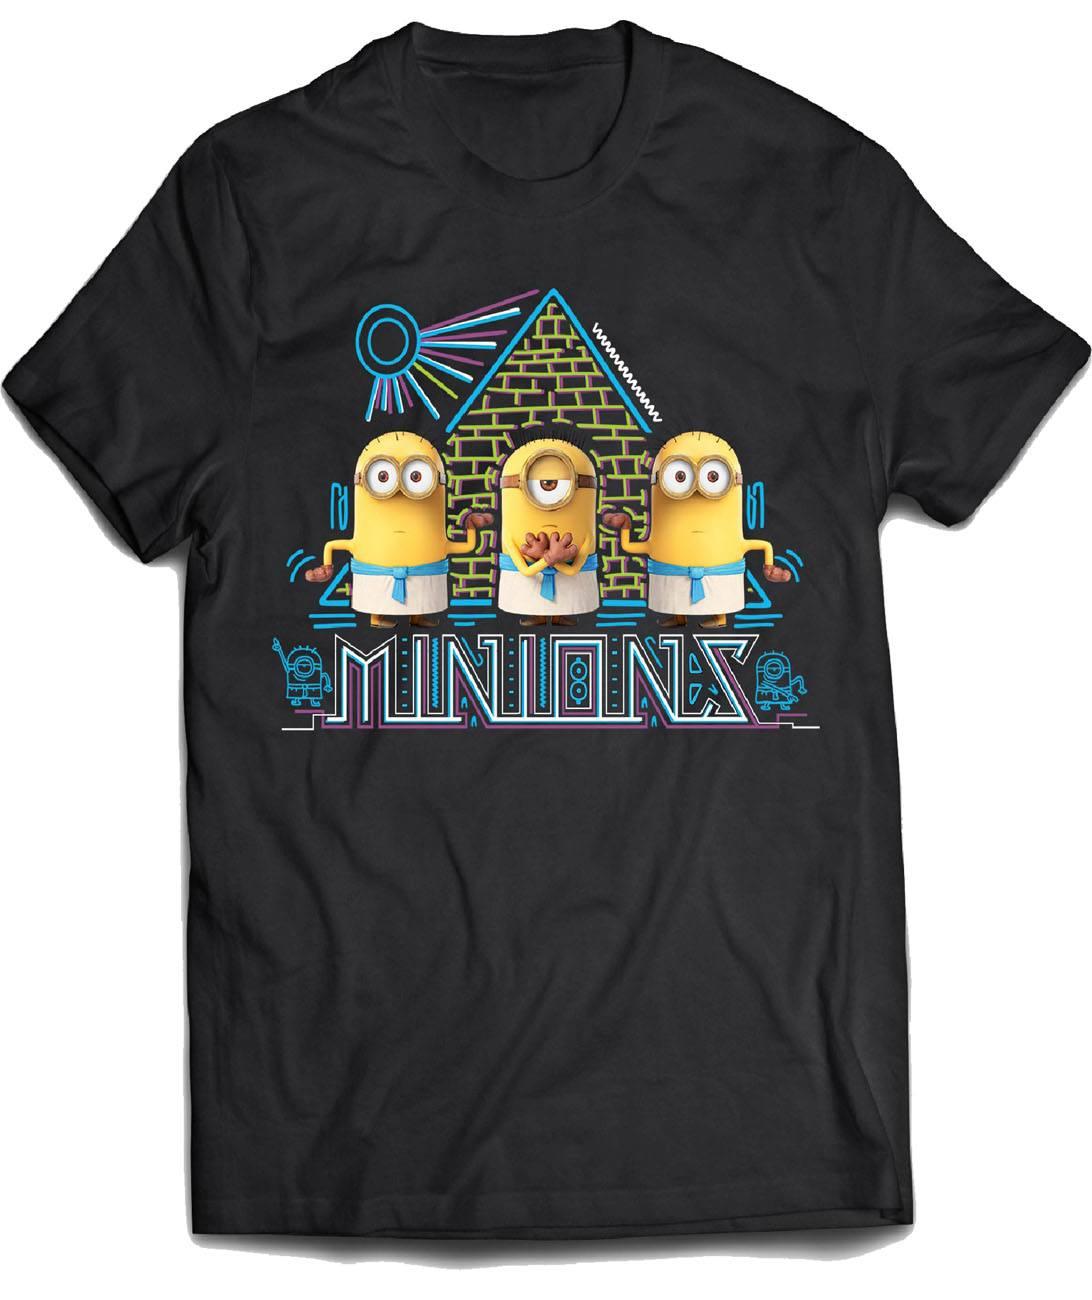 Minions T-Shirt Egypt Size XL